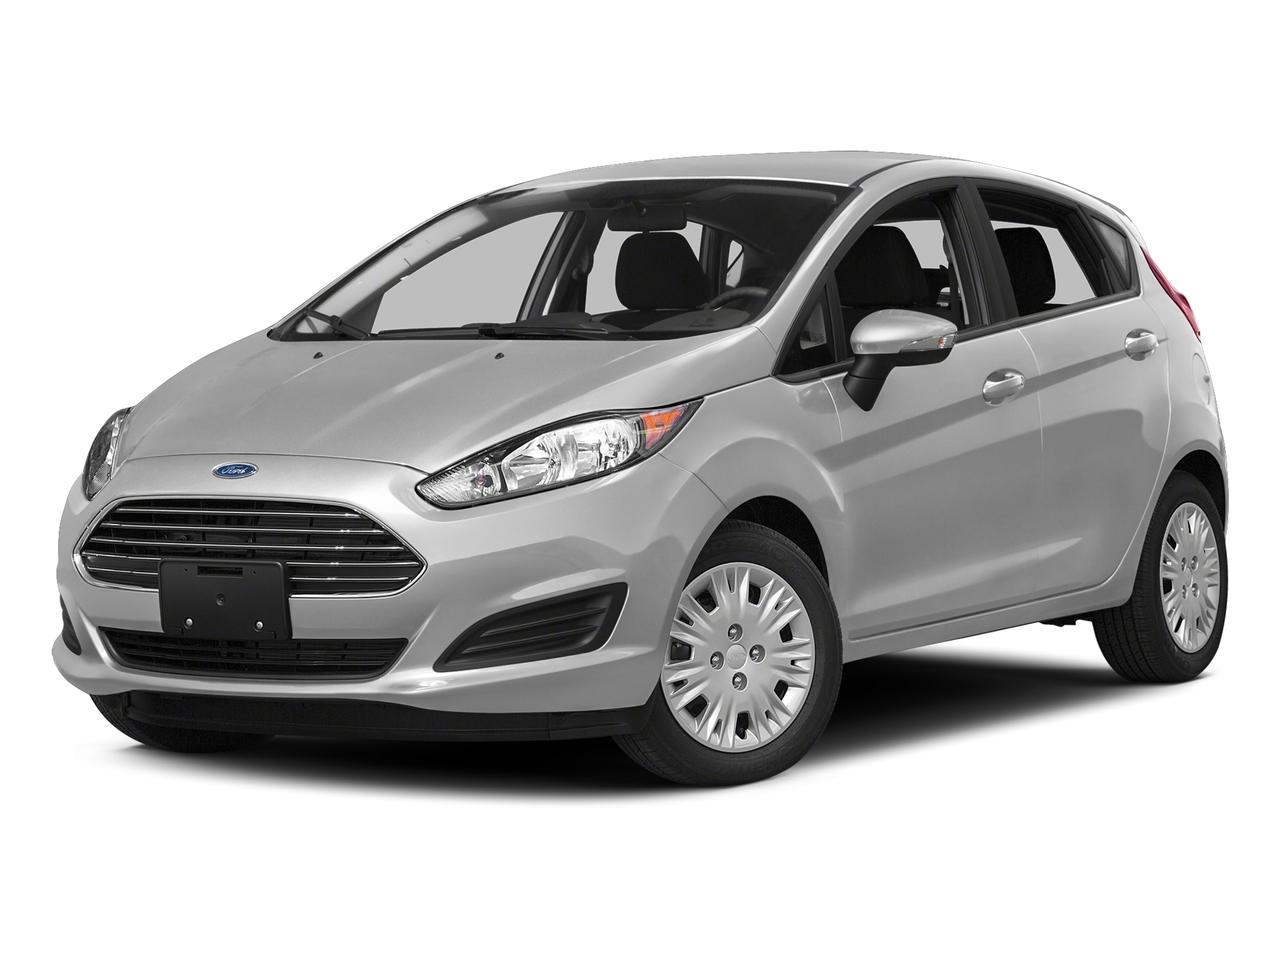 2016 Ford Fiesta Vehicle Photo in King George, VA 22485